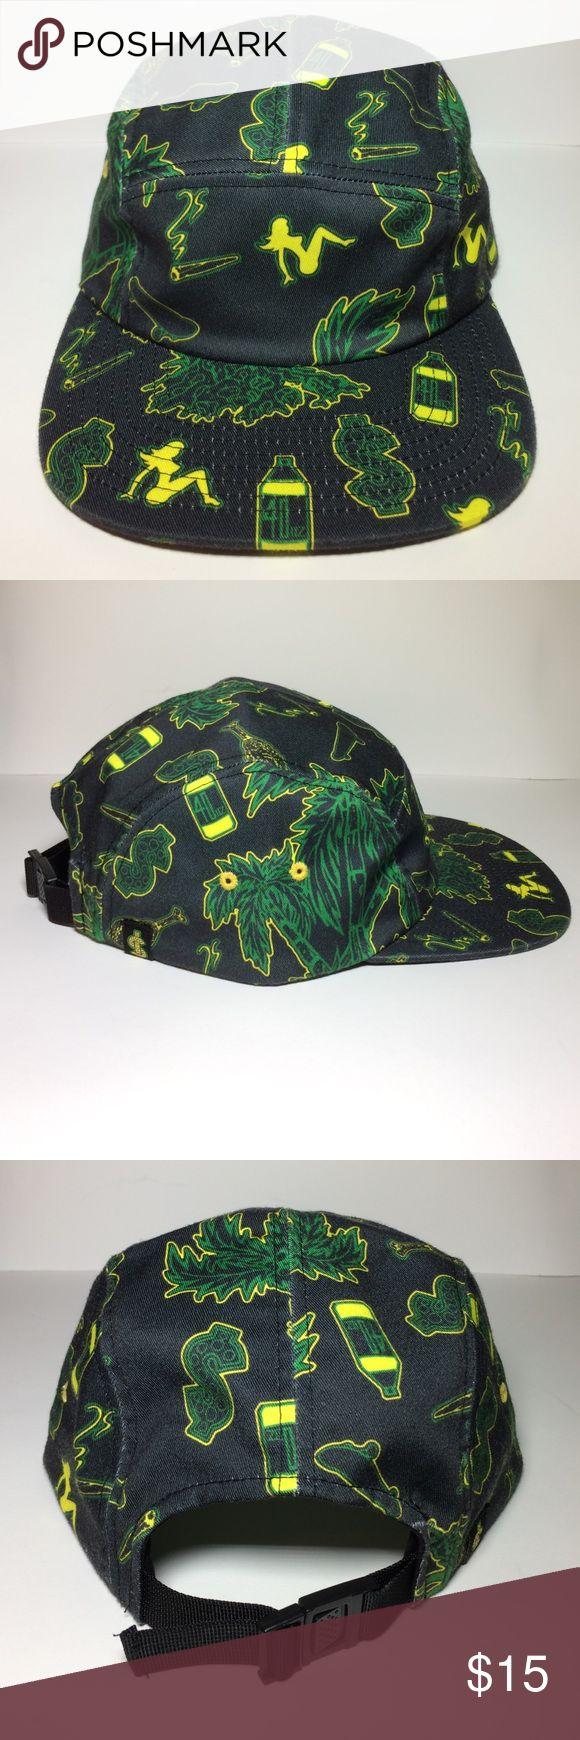 SHAKE JUNT 5 Panel Hat For sale is a SHAKE JUNT 5 panel hat (lightly worn). #alloverprint #chickenbone Shake Junt Accessories Hats